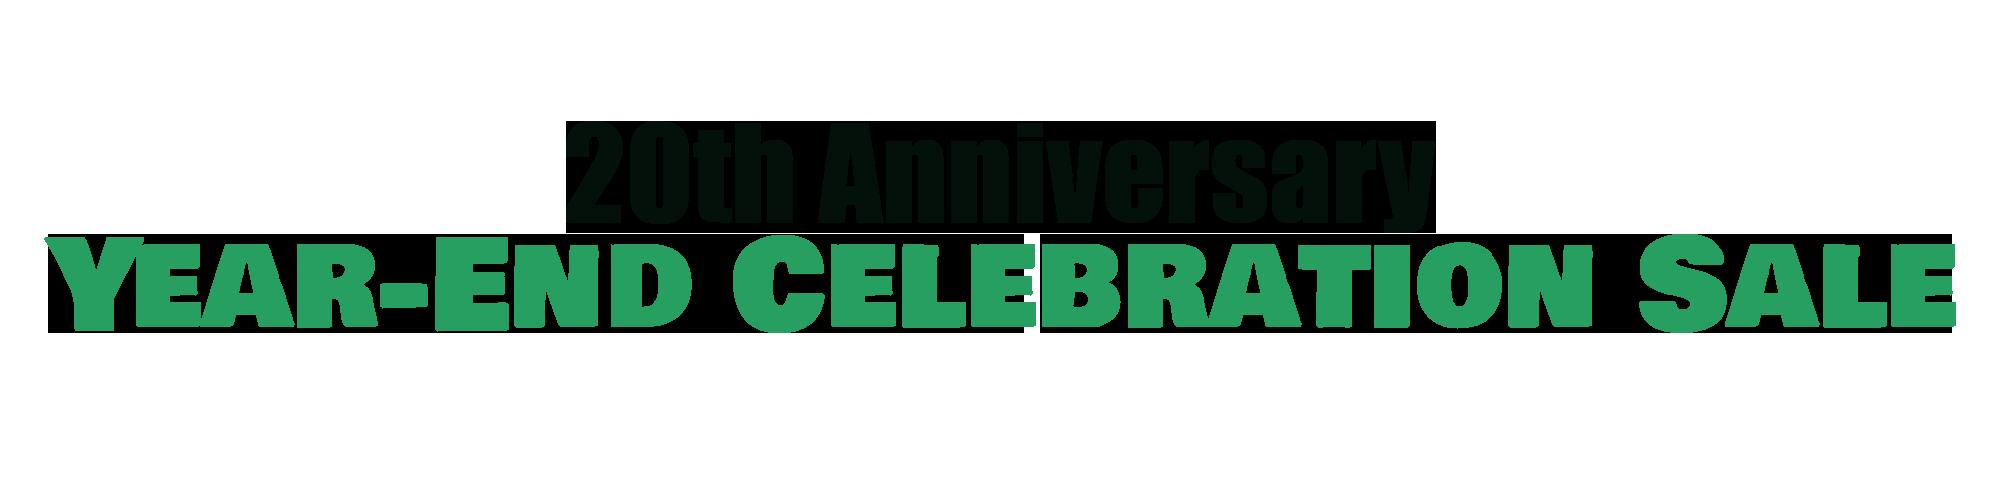 year-end-celebration-sale